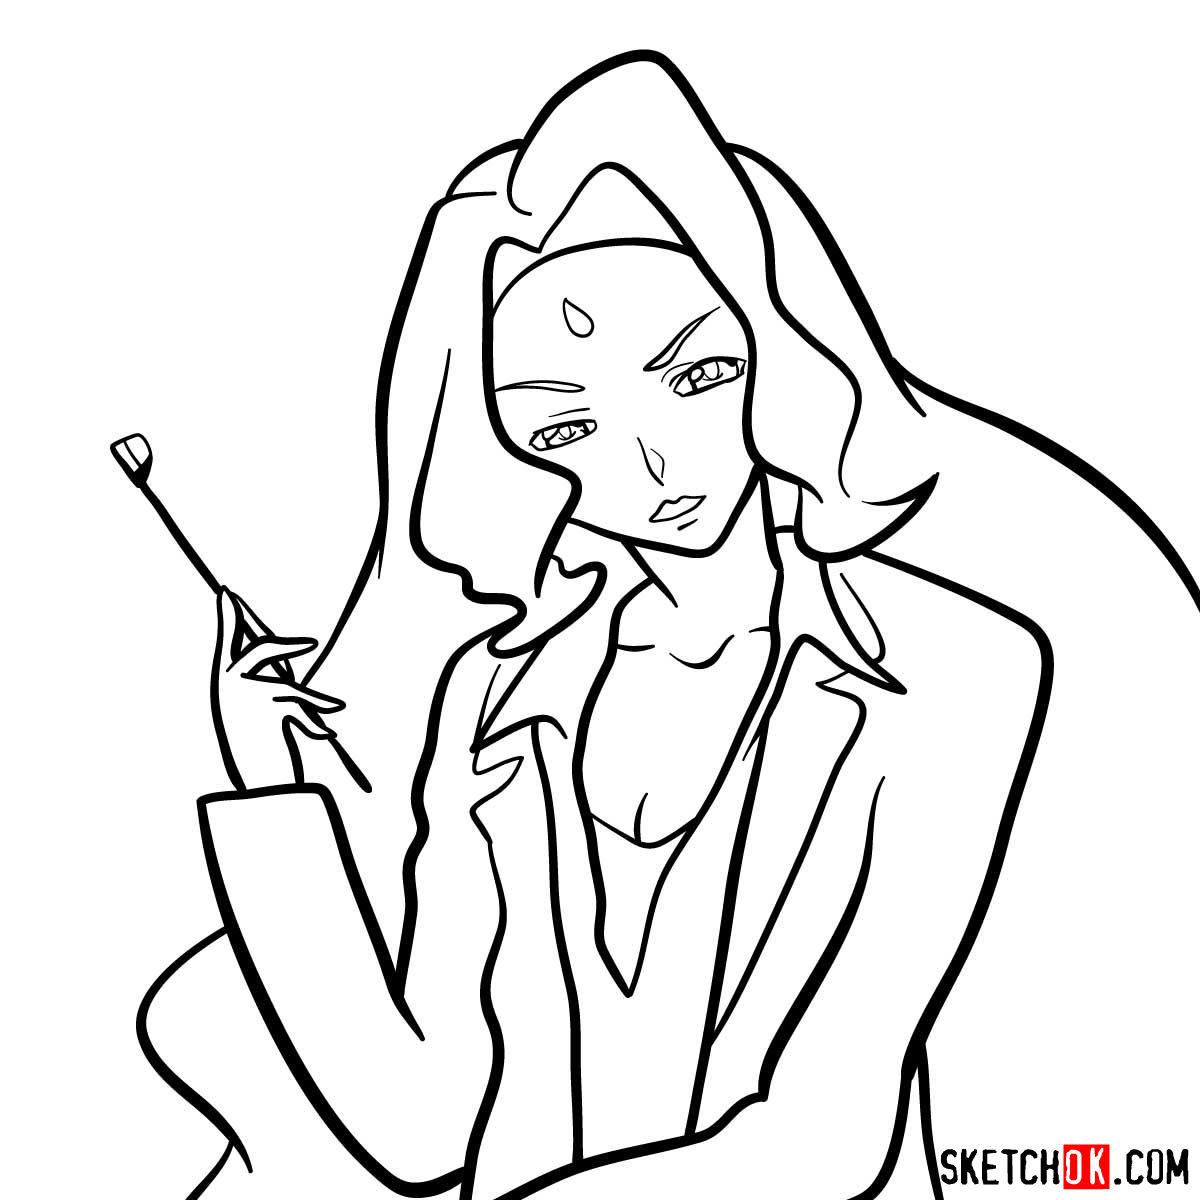 How to draw Rakshata Chawla | Code Geass anime - step 12